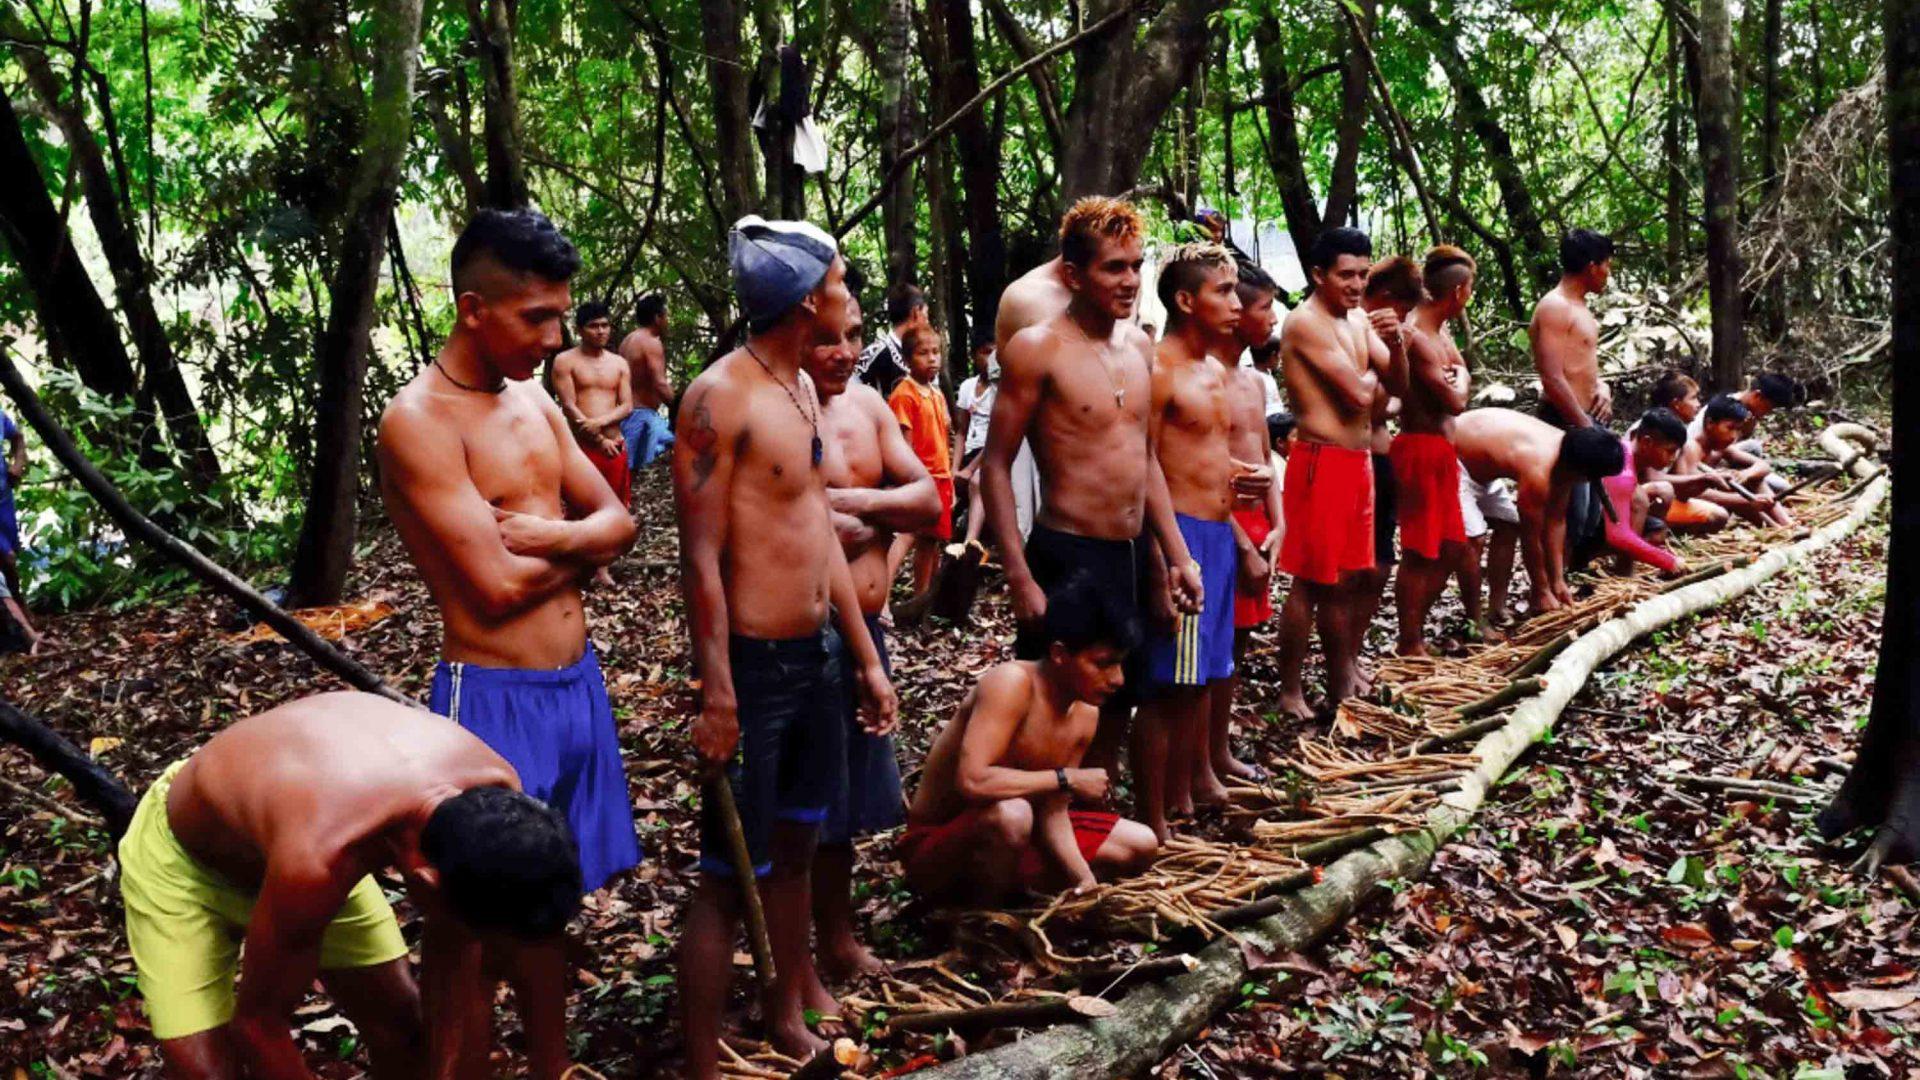 Reza Pakravan takes part in the Munduruku tribe's annual fishing ritual.